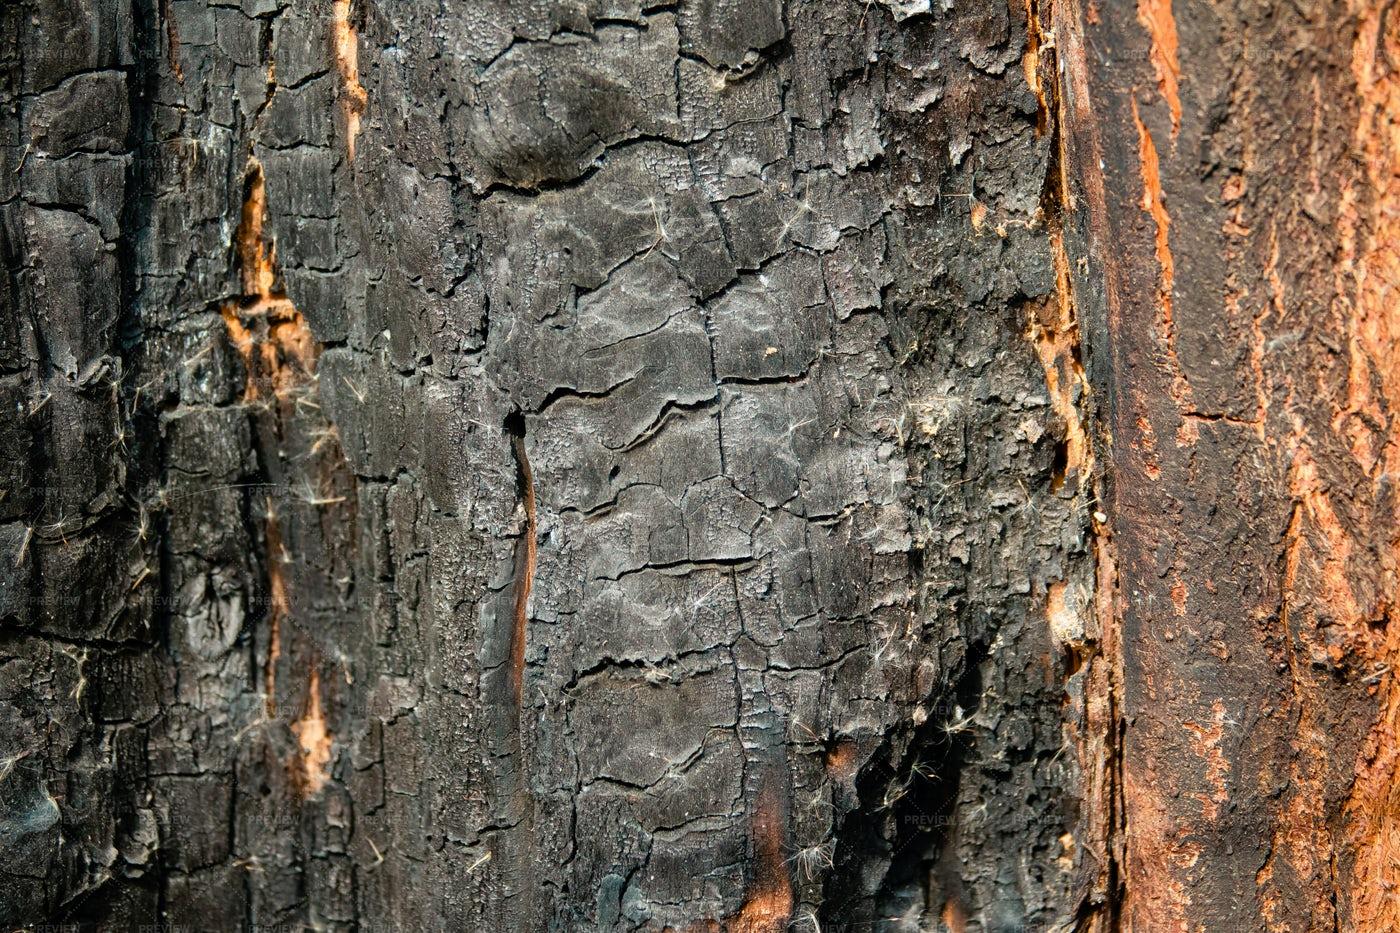 Burnt Tree Bark Texture: Stock Photos